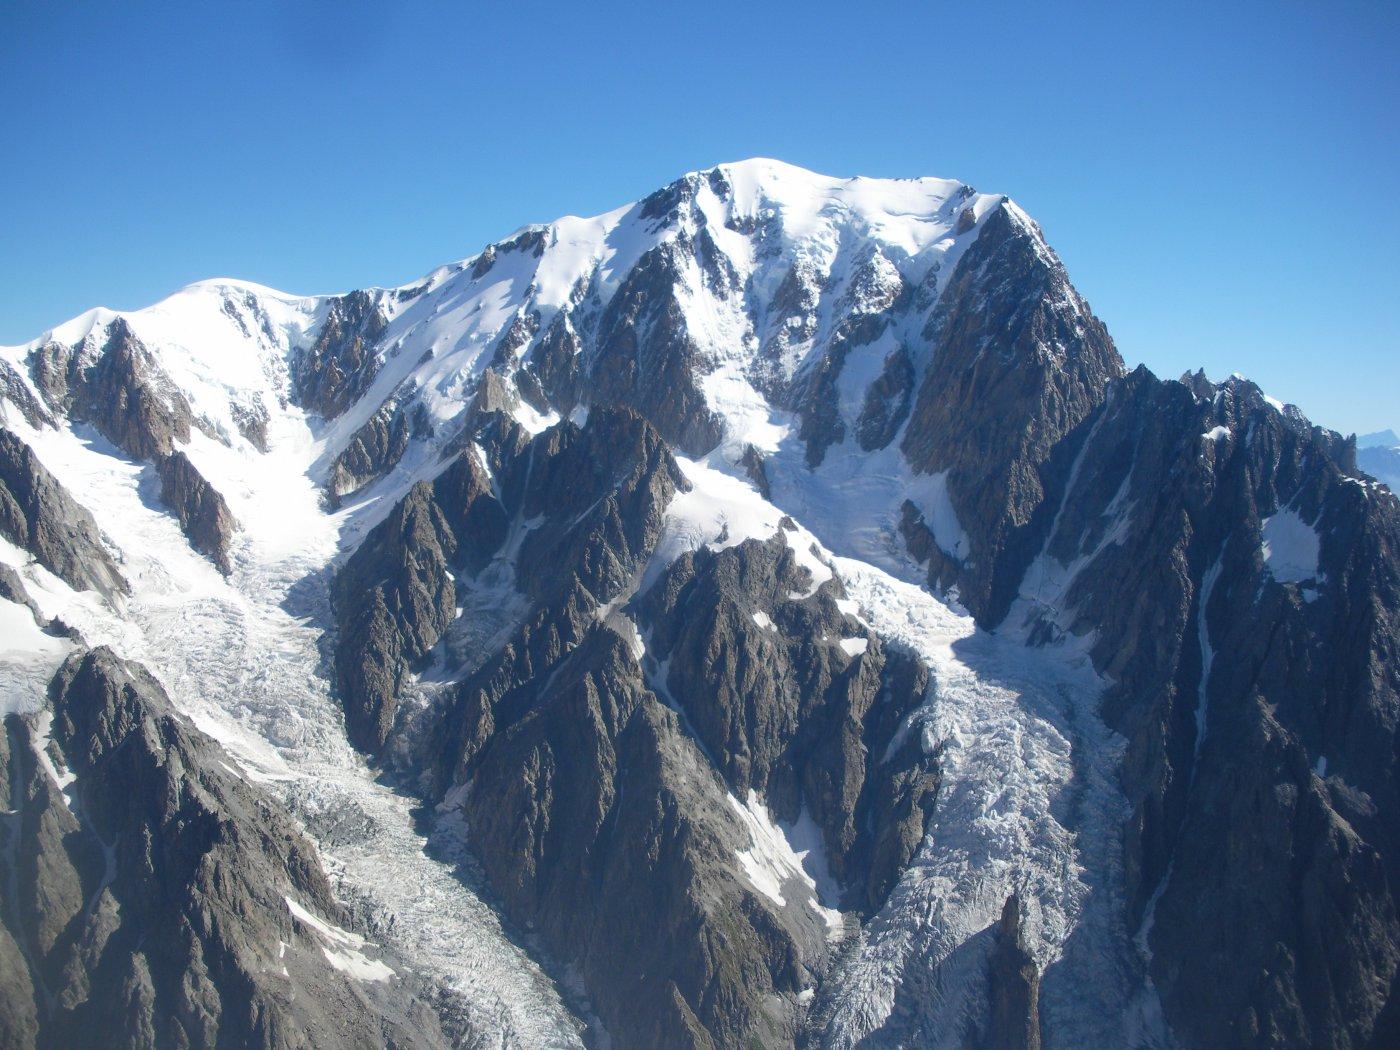 l'Himalaiana parete ovest del Bianco..